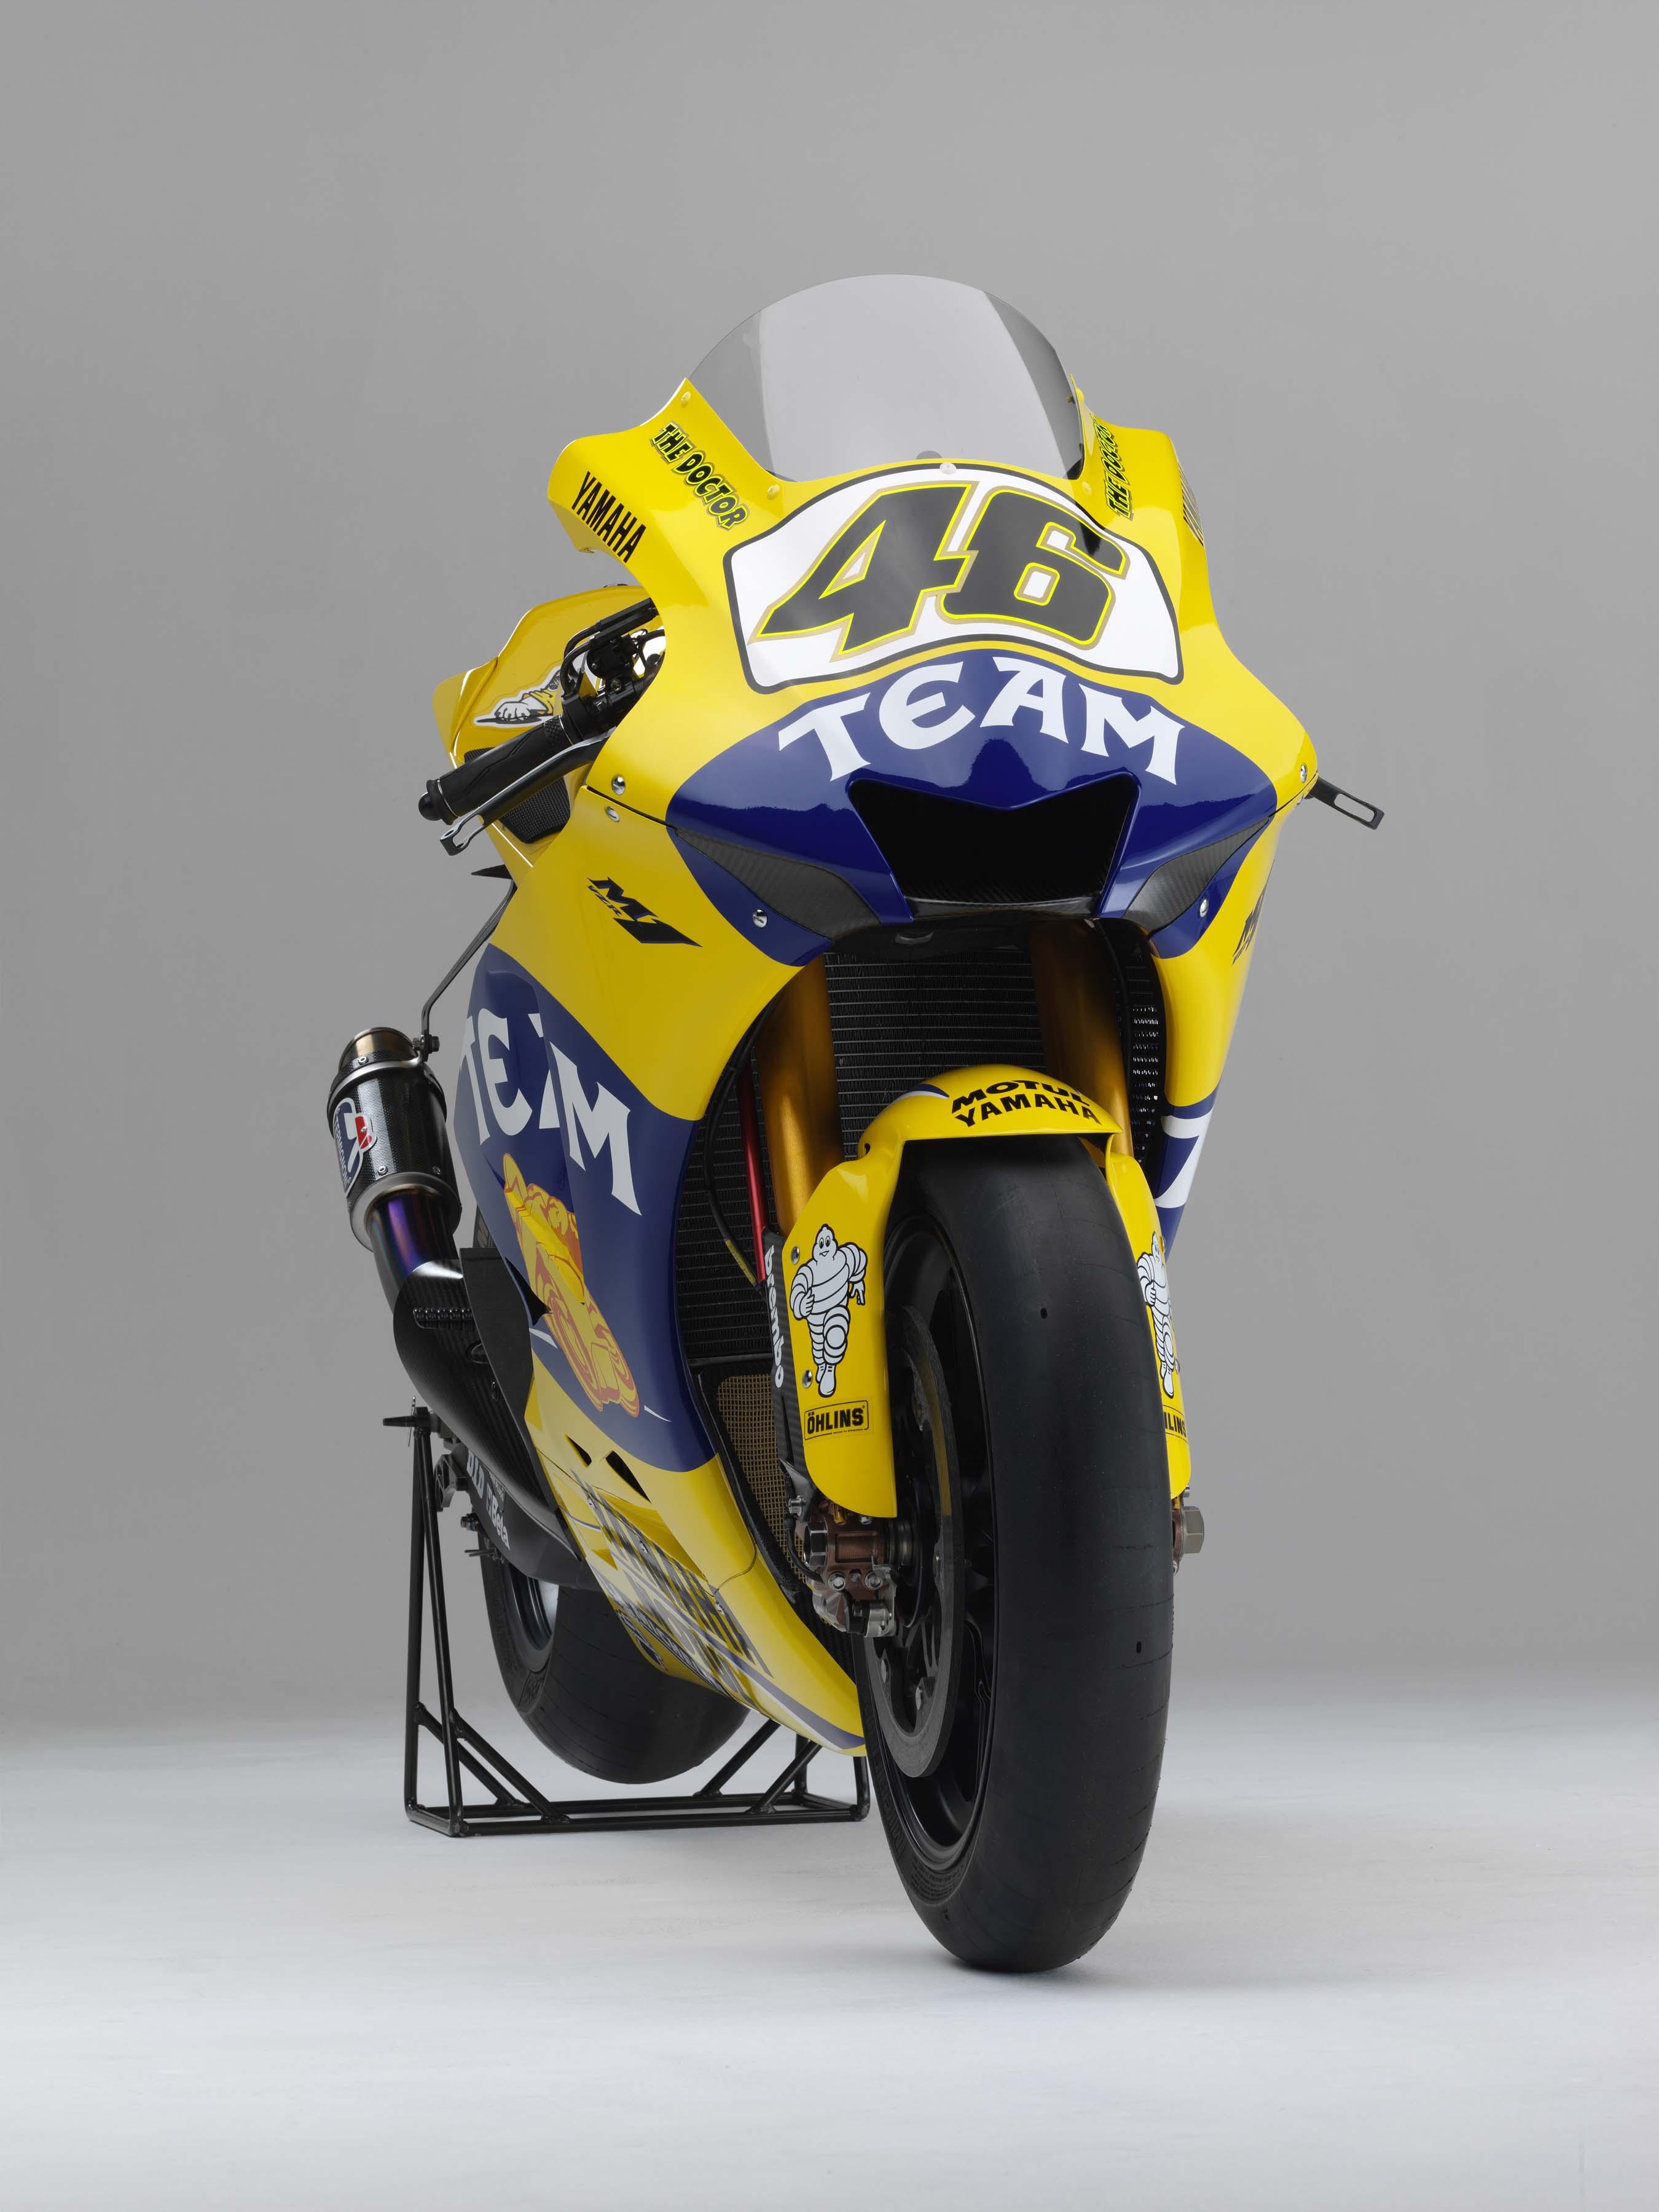 Xxx Valentino Rossi S 2006 Yamaha Yzr M1 Asphalt Amp Rubber